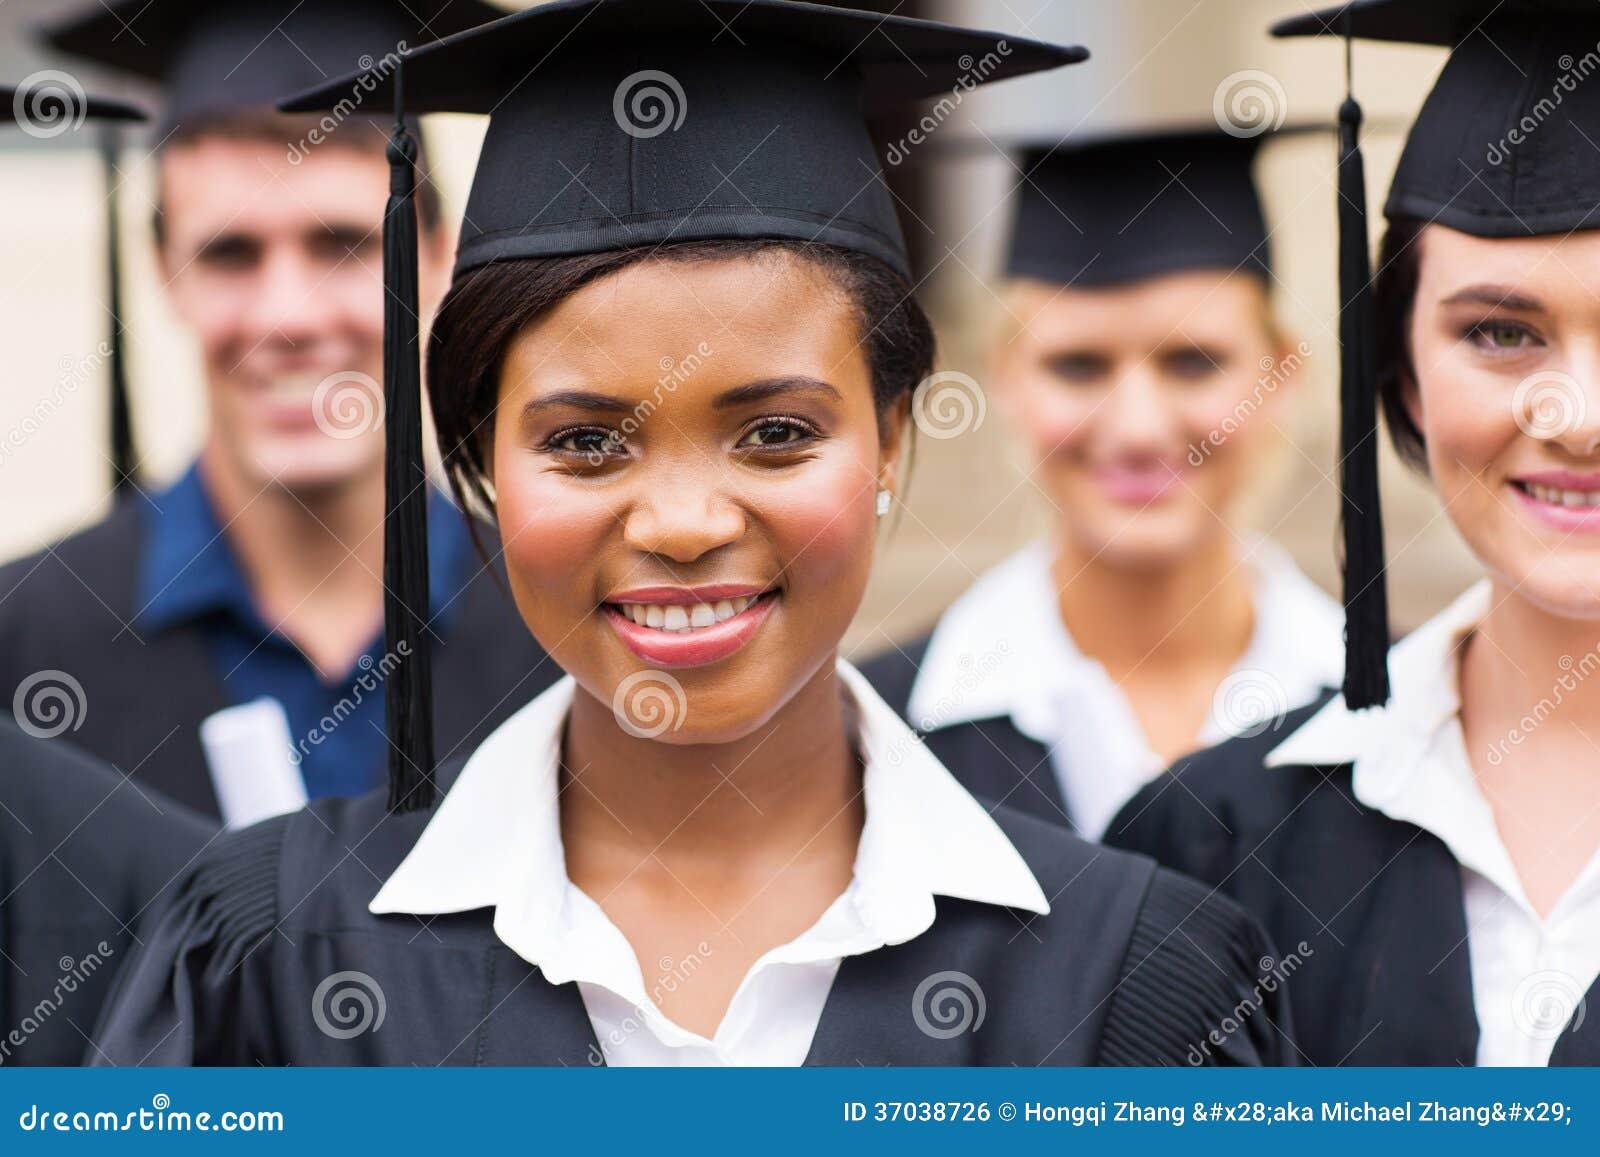 Groeps mensen met universitaire diploma s